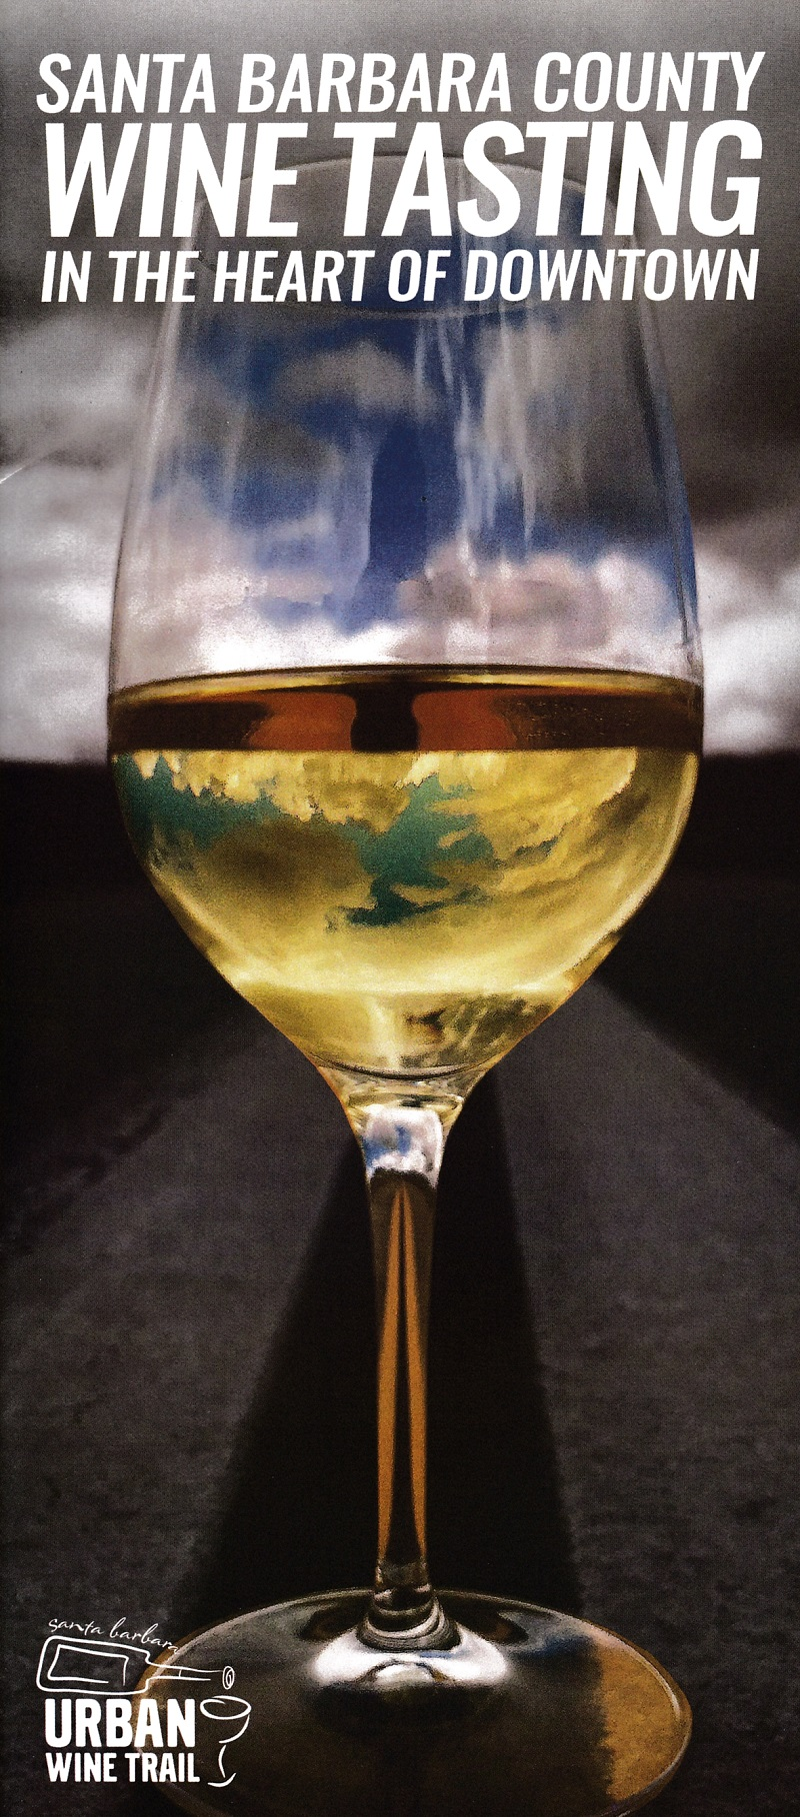 Urban Wine Trails